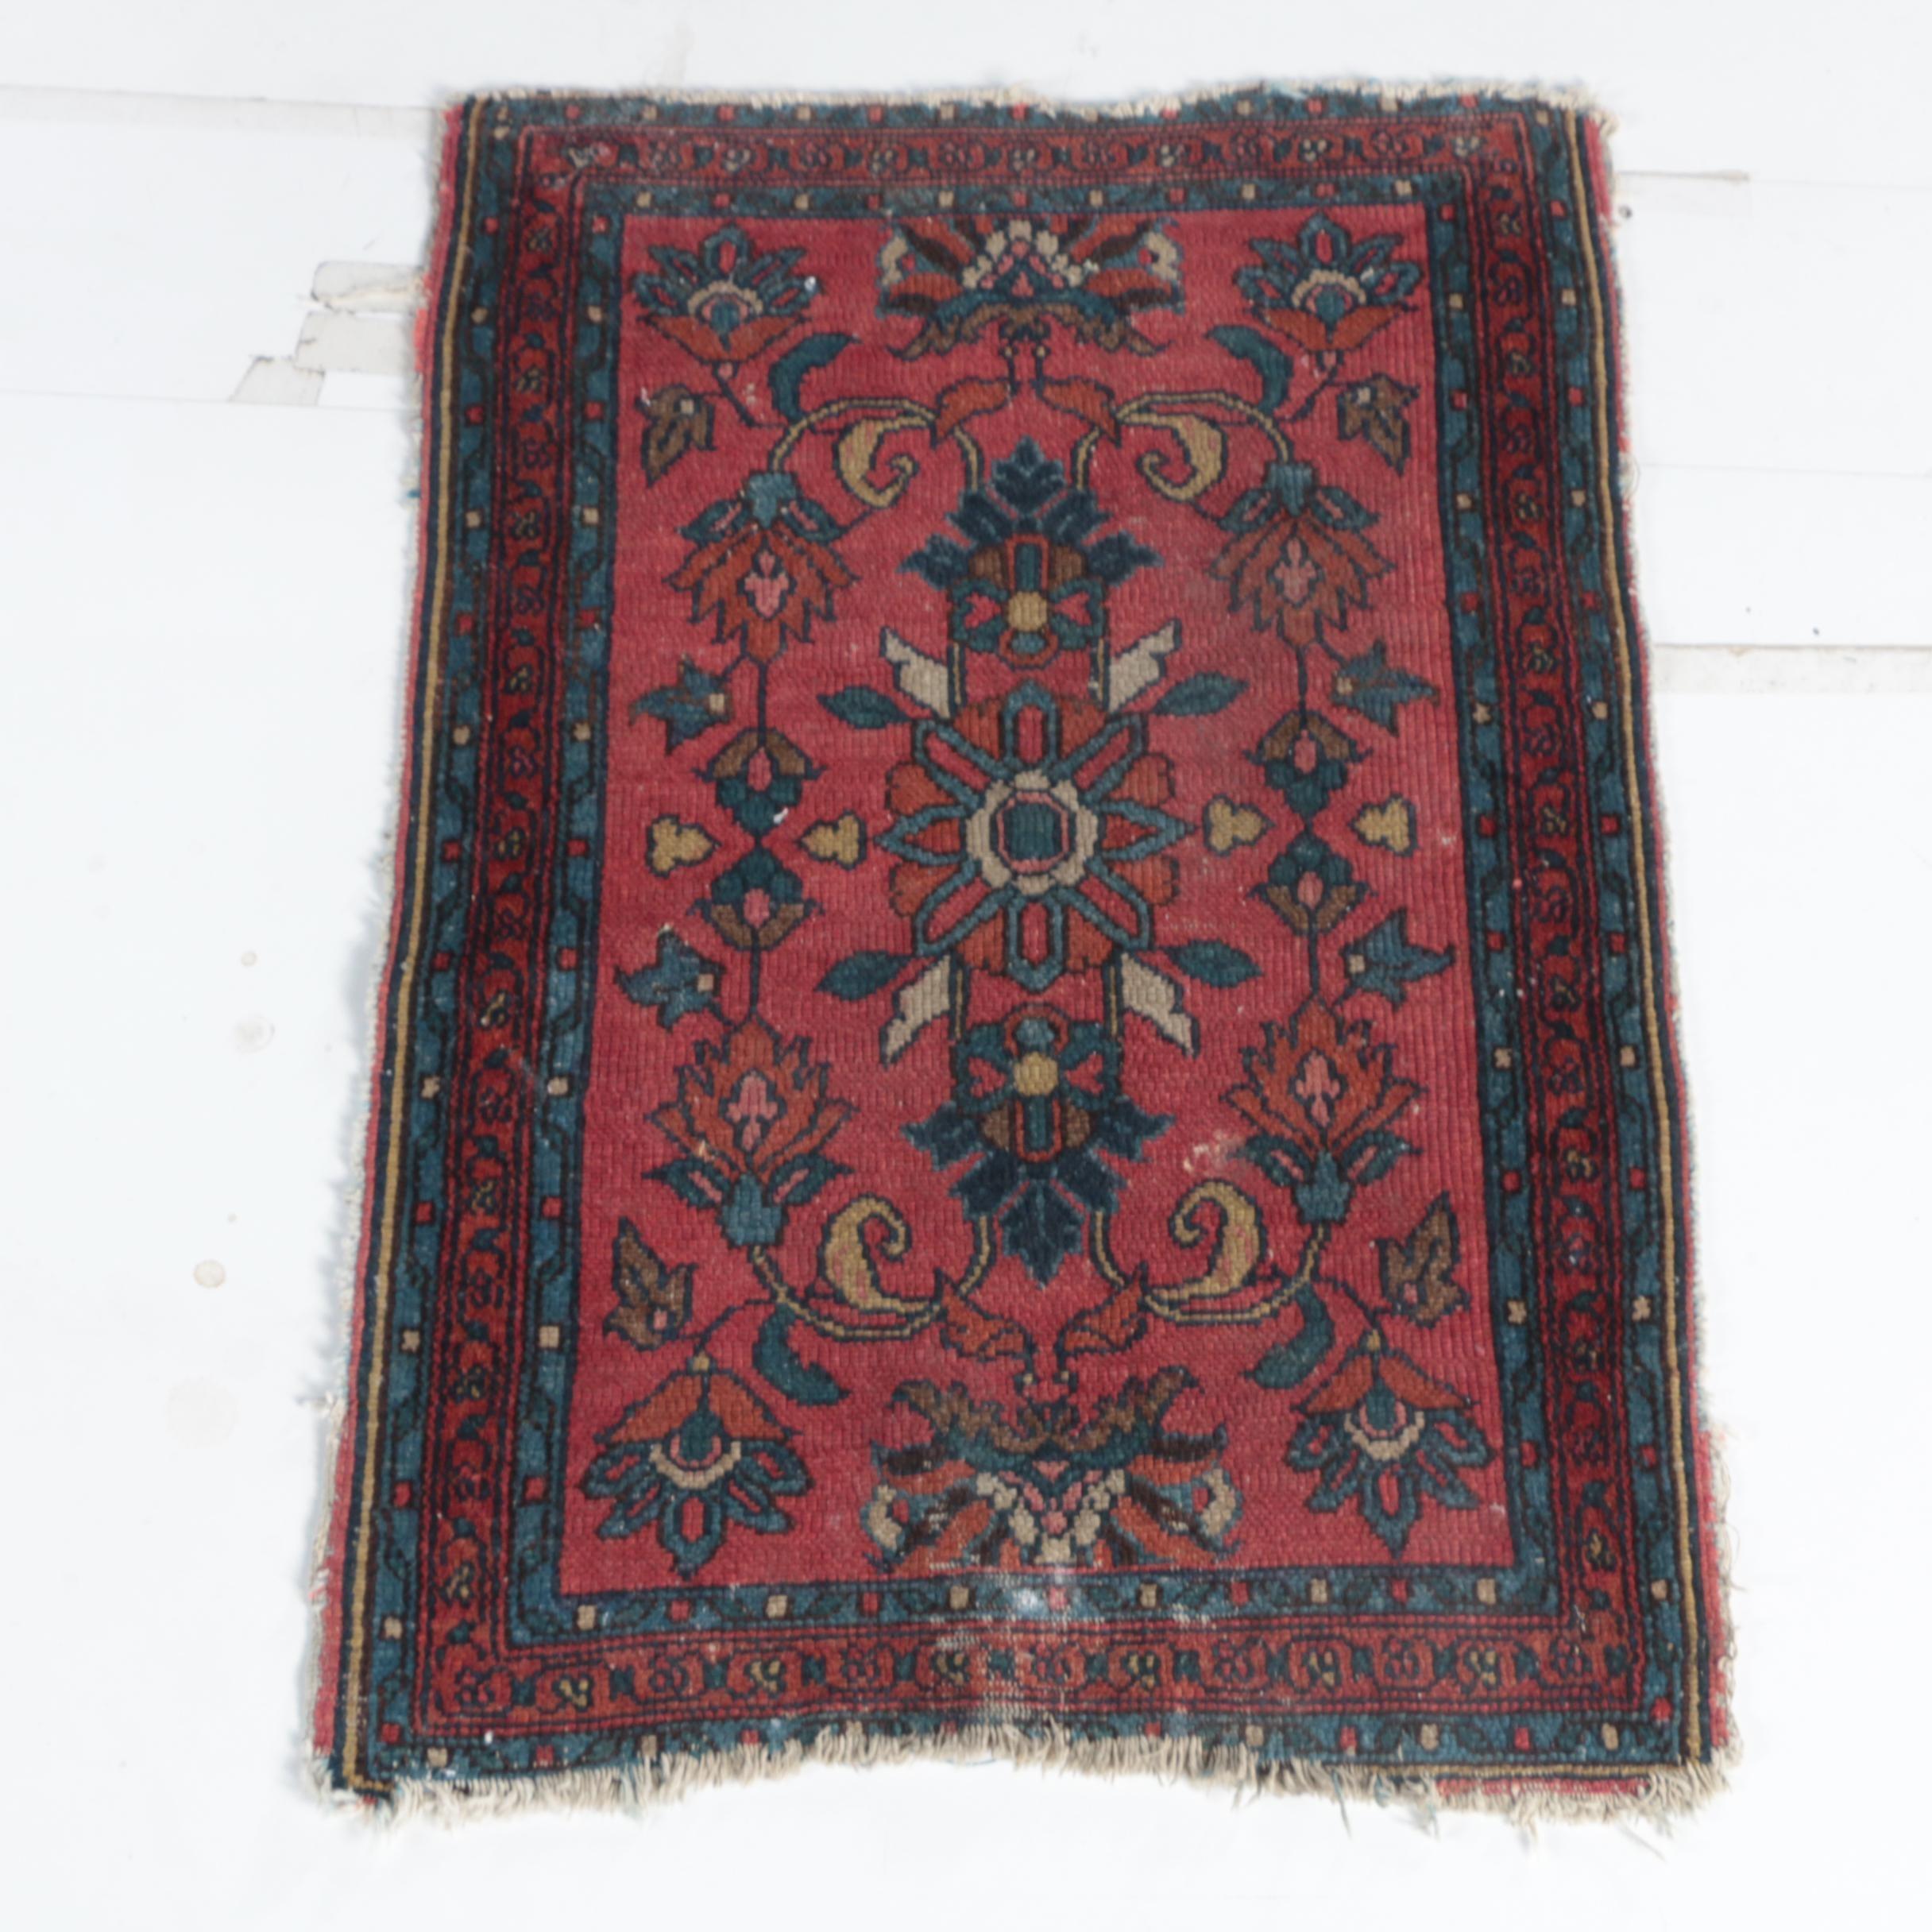 Antique Handwoven Persian Lilihan Wool Accent Rug